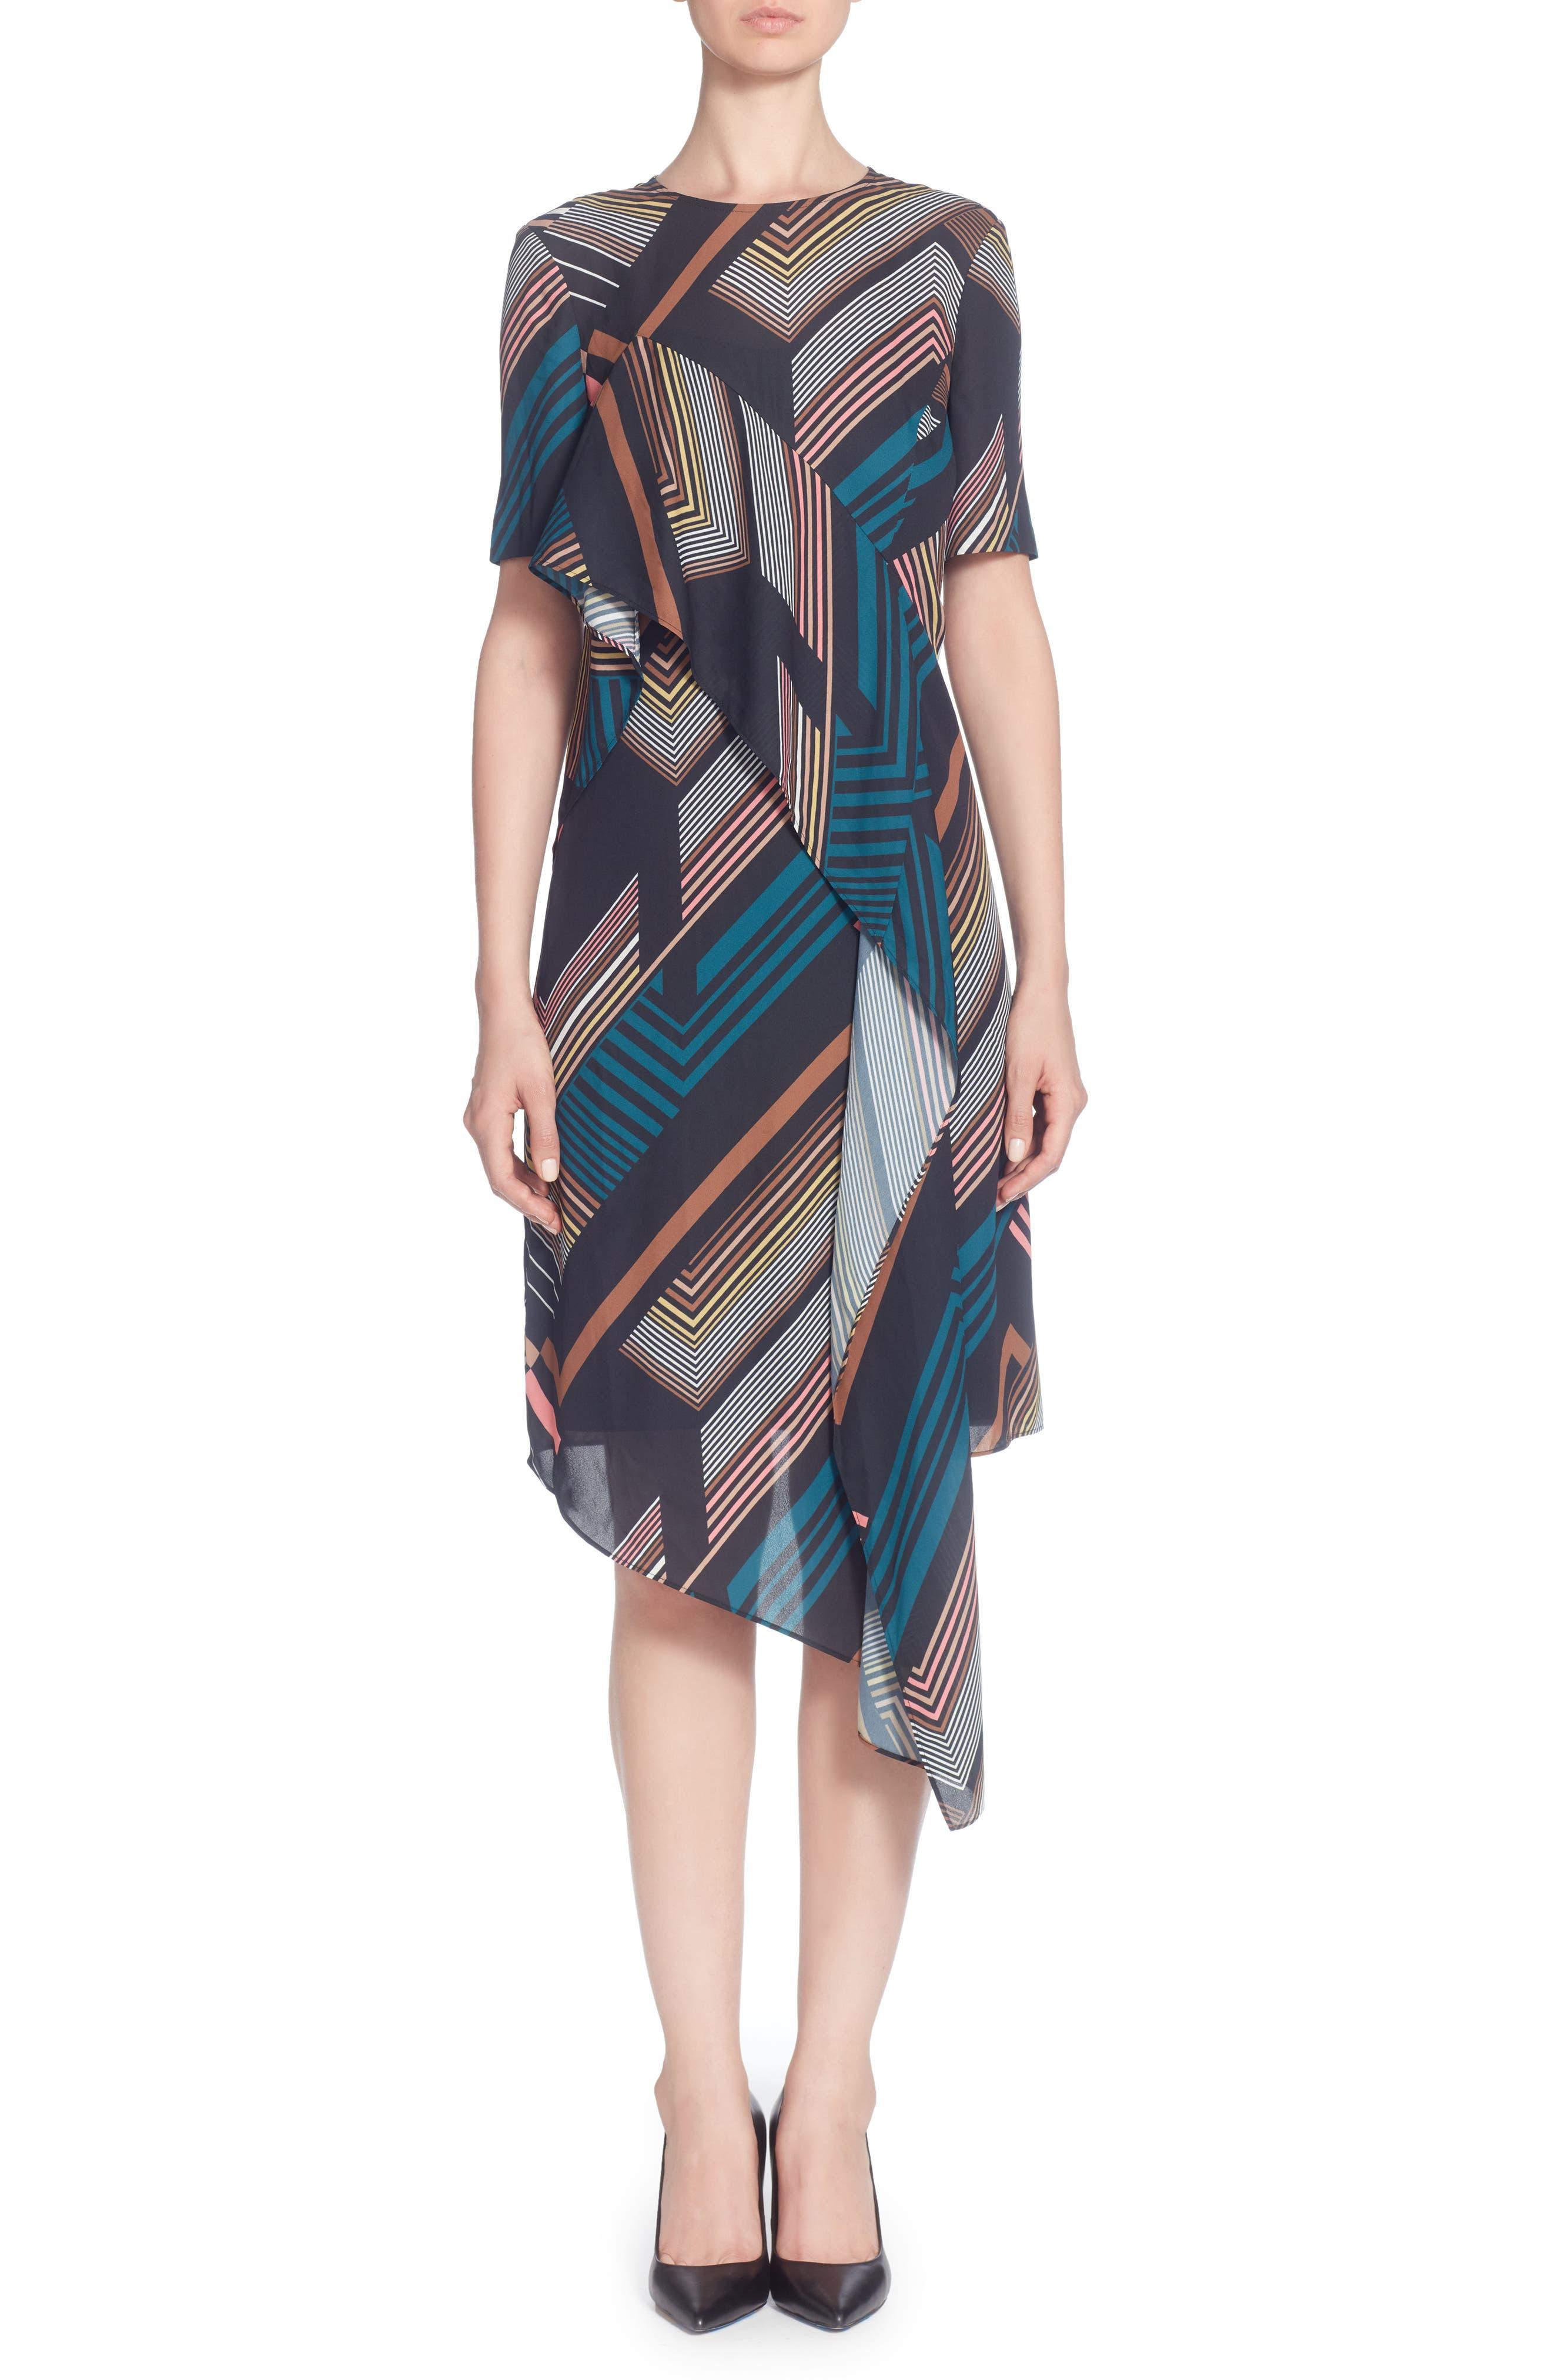 CATHERINE CATHERINE MALANDRINO, Lill Asymmetrical Hem Dress, Main thumbnail 1, color, 001